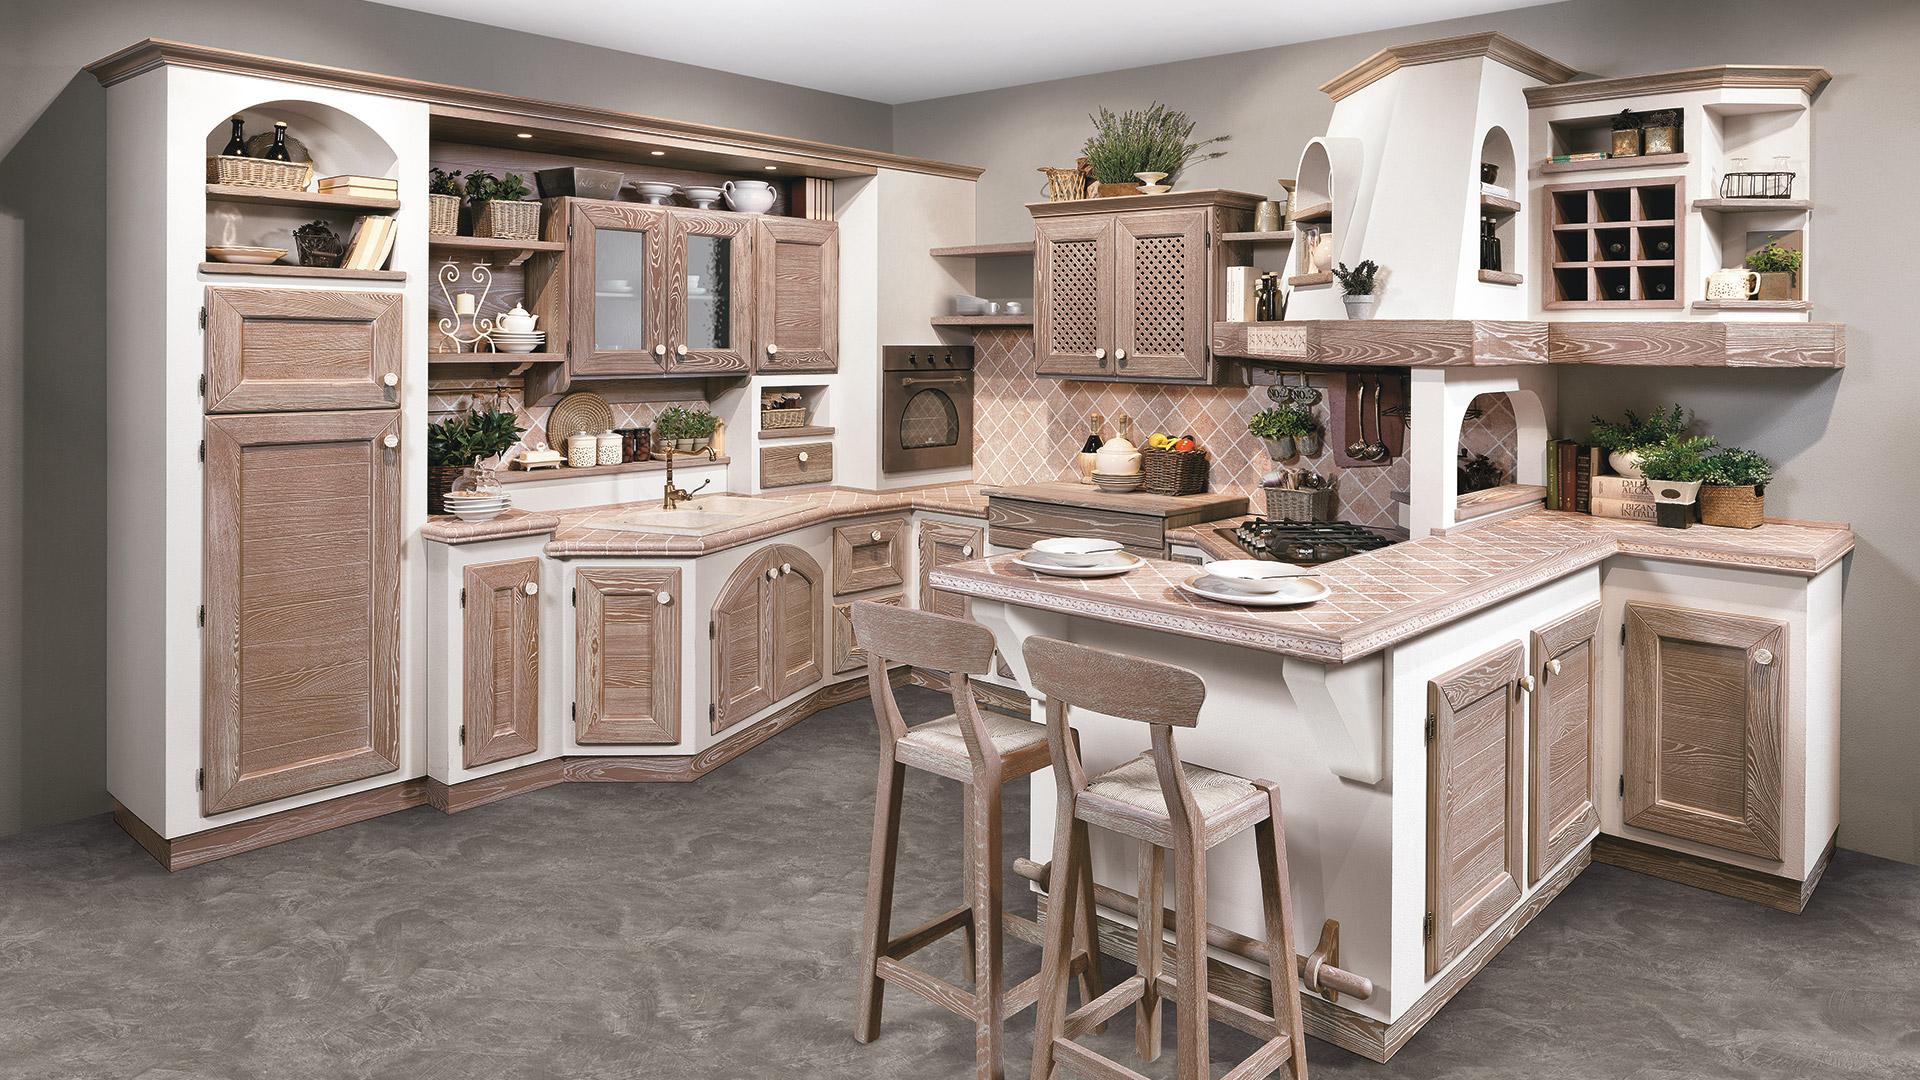 Cucine Classiche - TuttoLegno Arredamenti